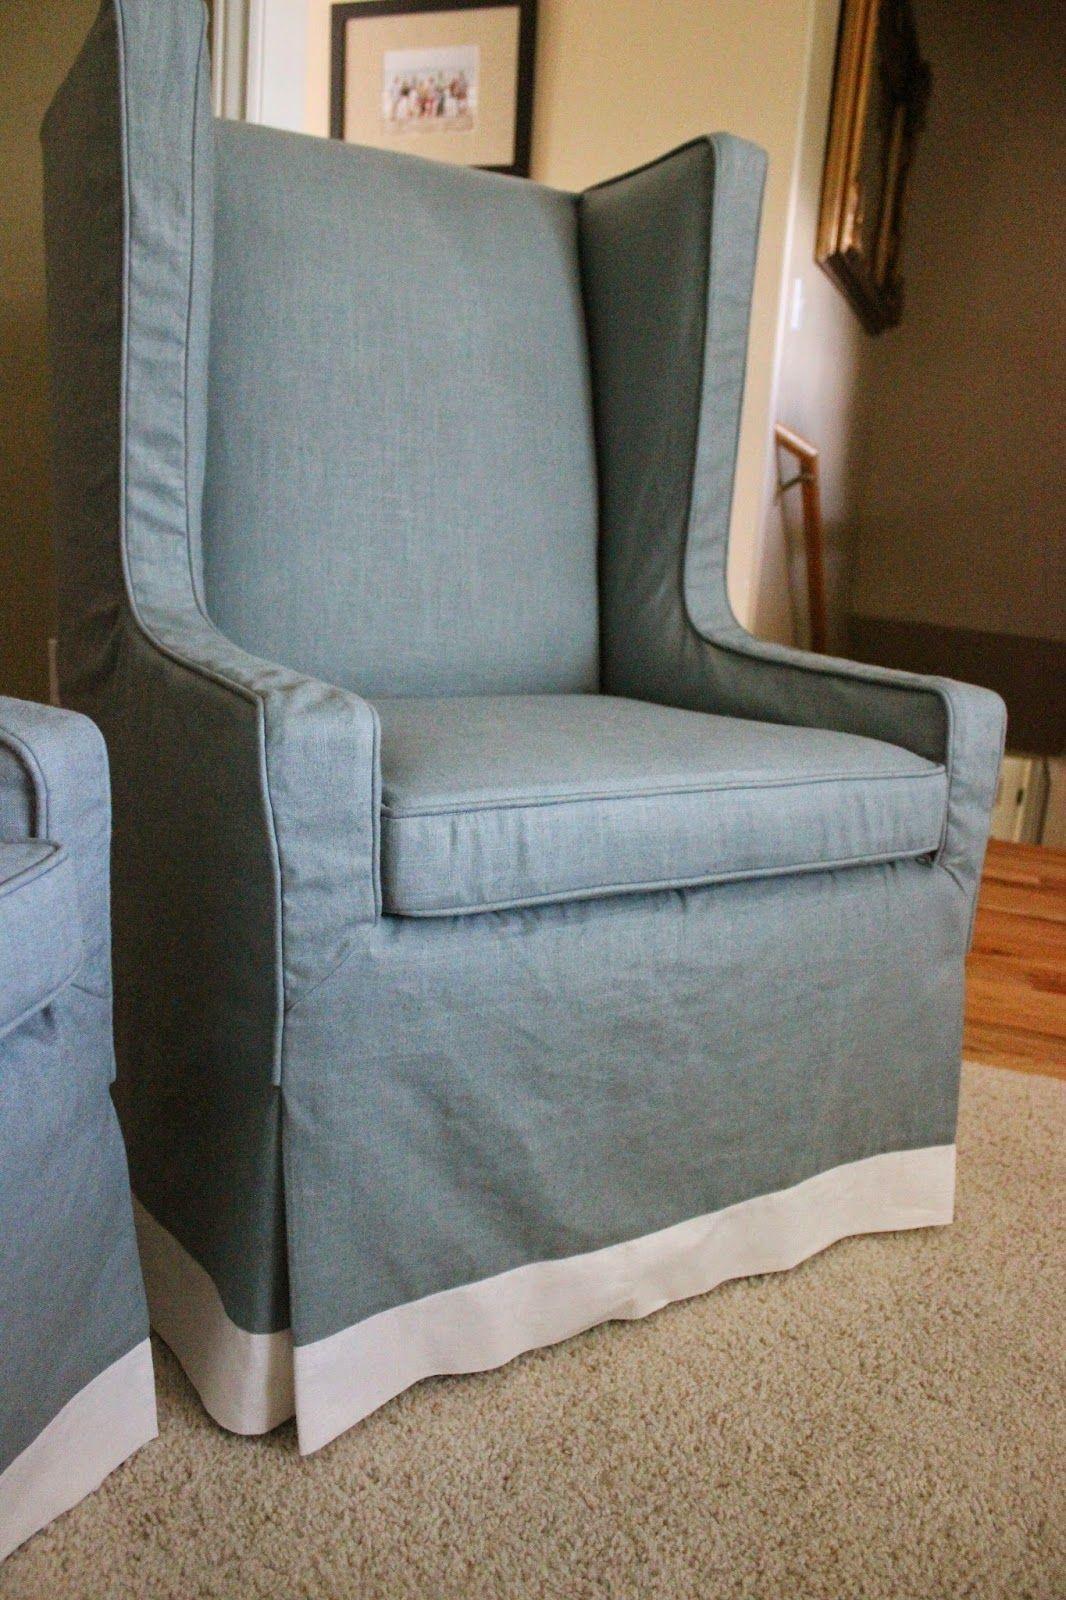 Waterfall Skirt And Banding Slipcovers, Chair. Slipcovered Furniture, DIY  Slipcovers, Custom Slipcovers, Blue Fabric, Linen.